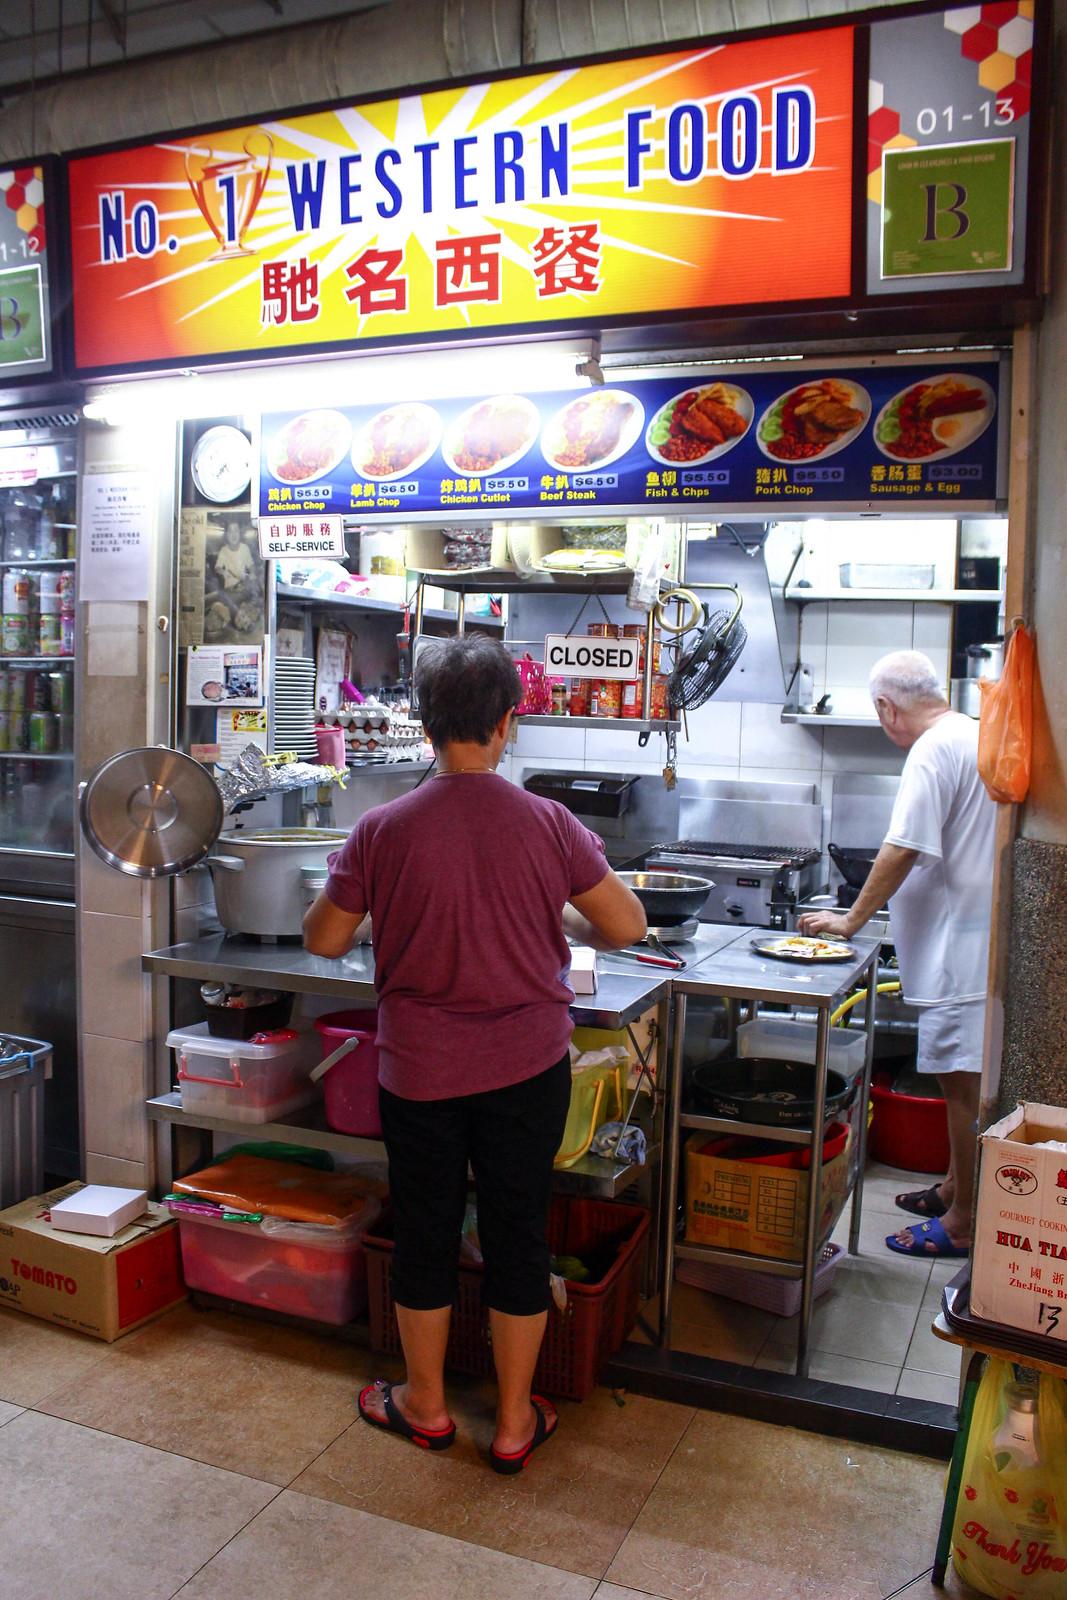 Tanglin Halt: No.1 Western Food